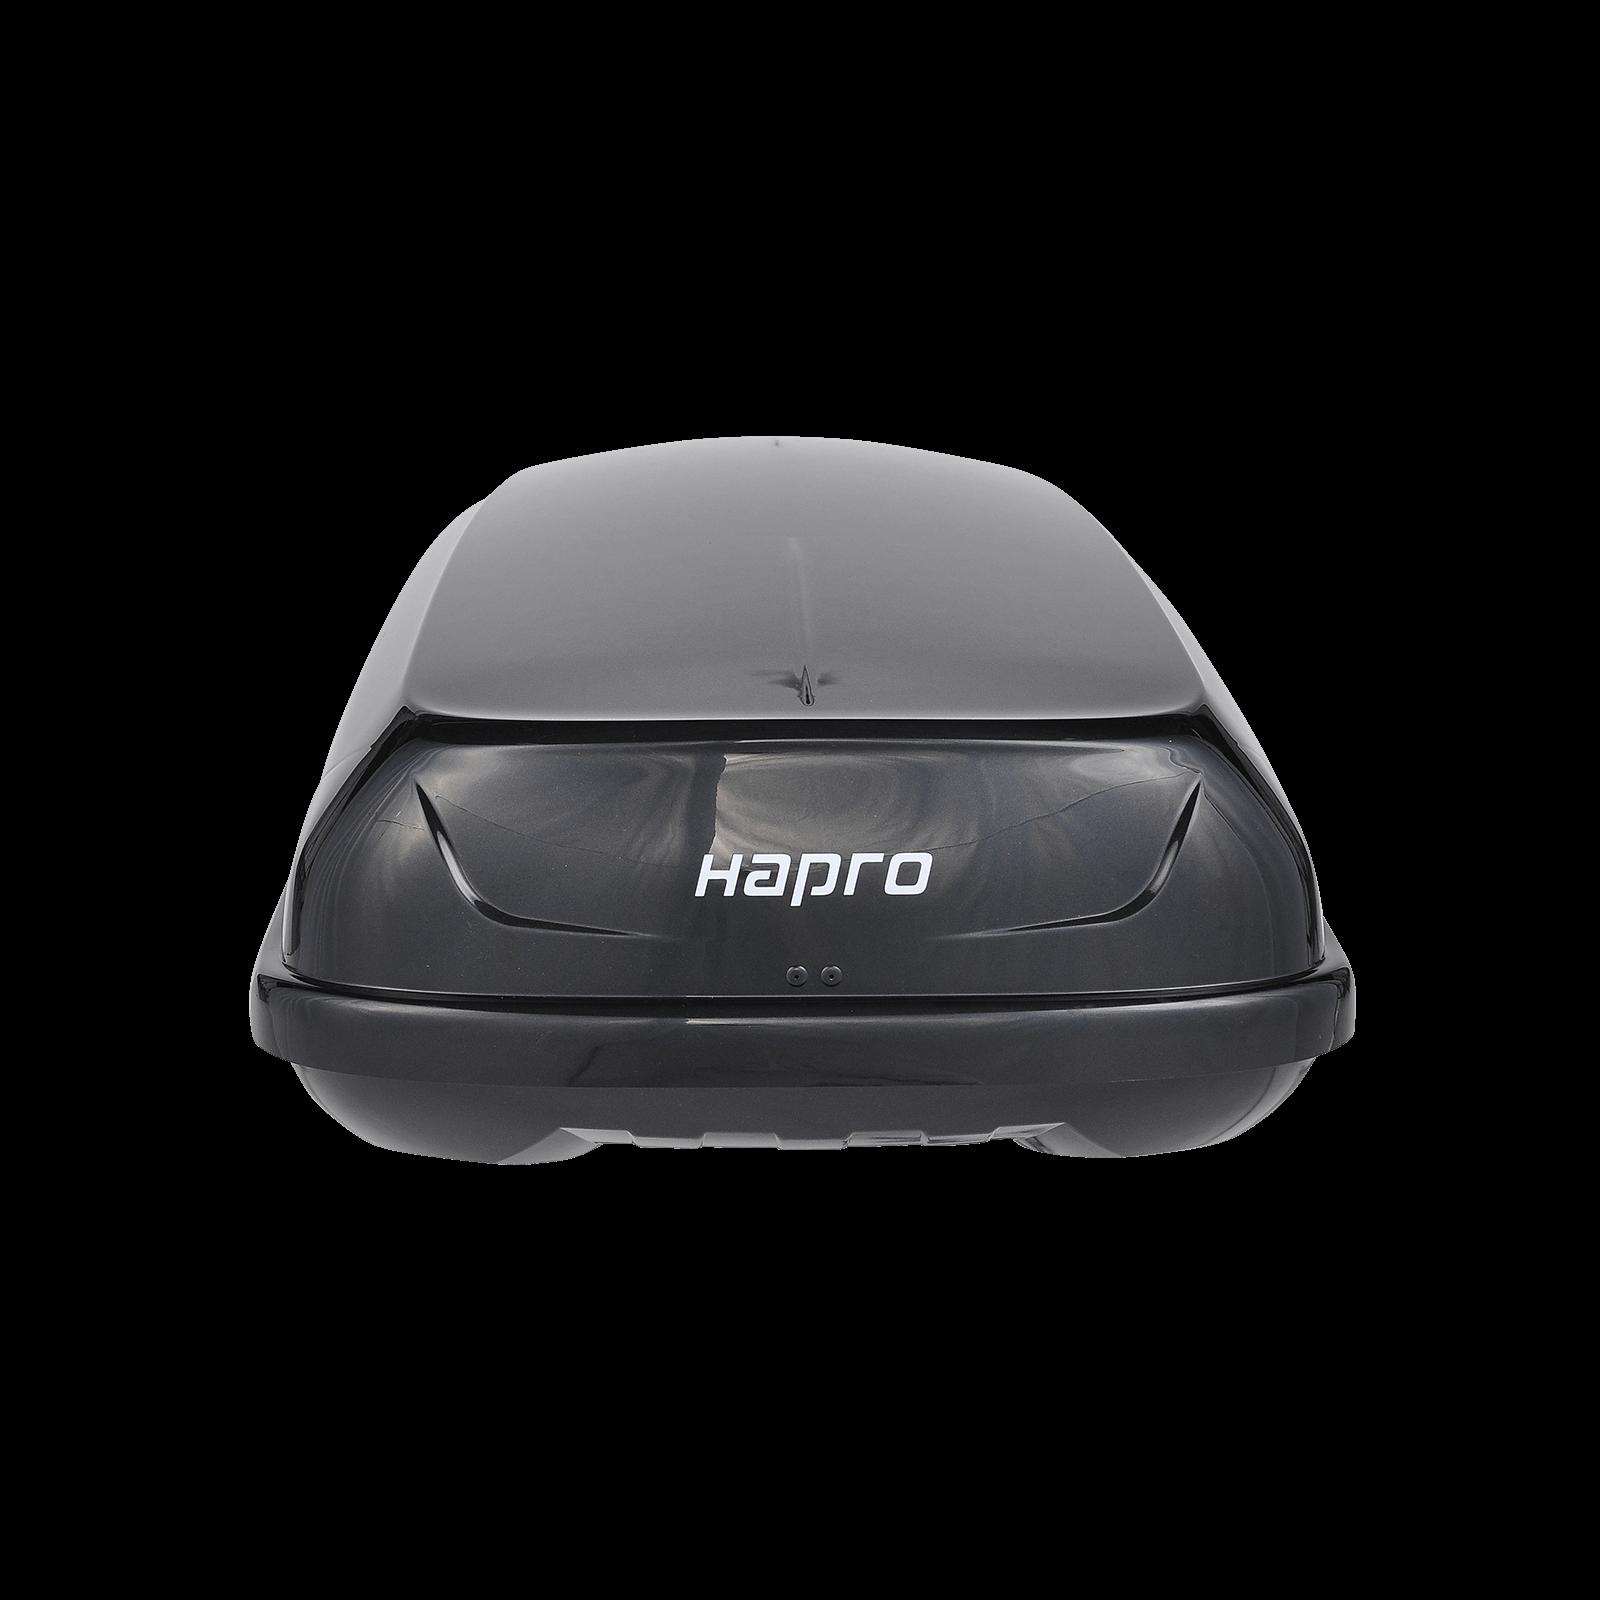 Dachbox Hapro Traxer 8.6 Brilliantblack - Bild 4